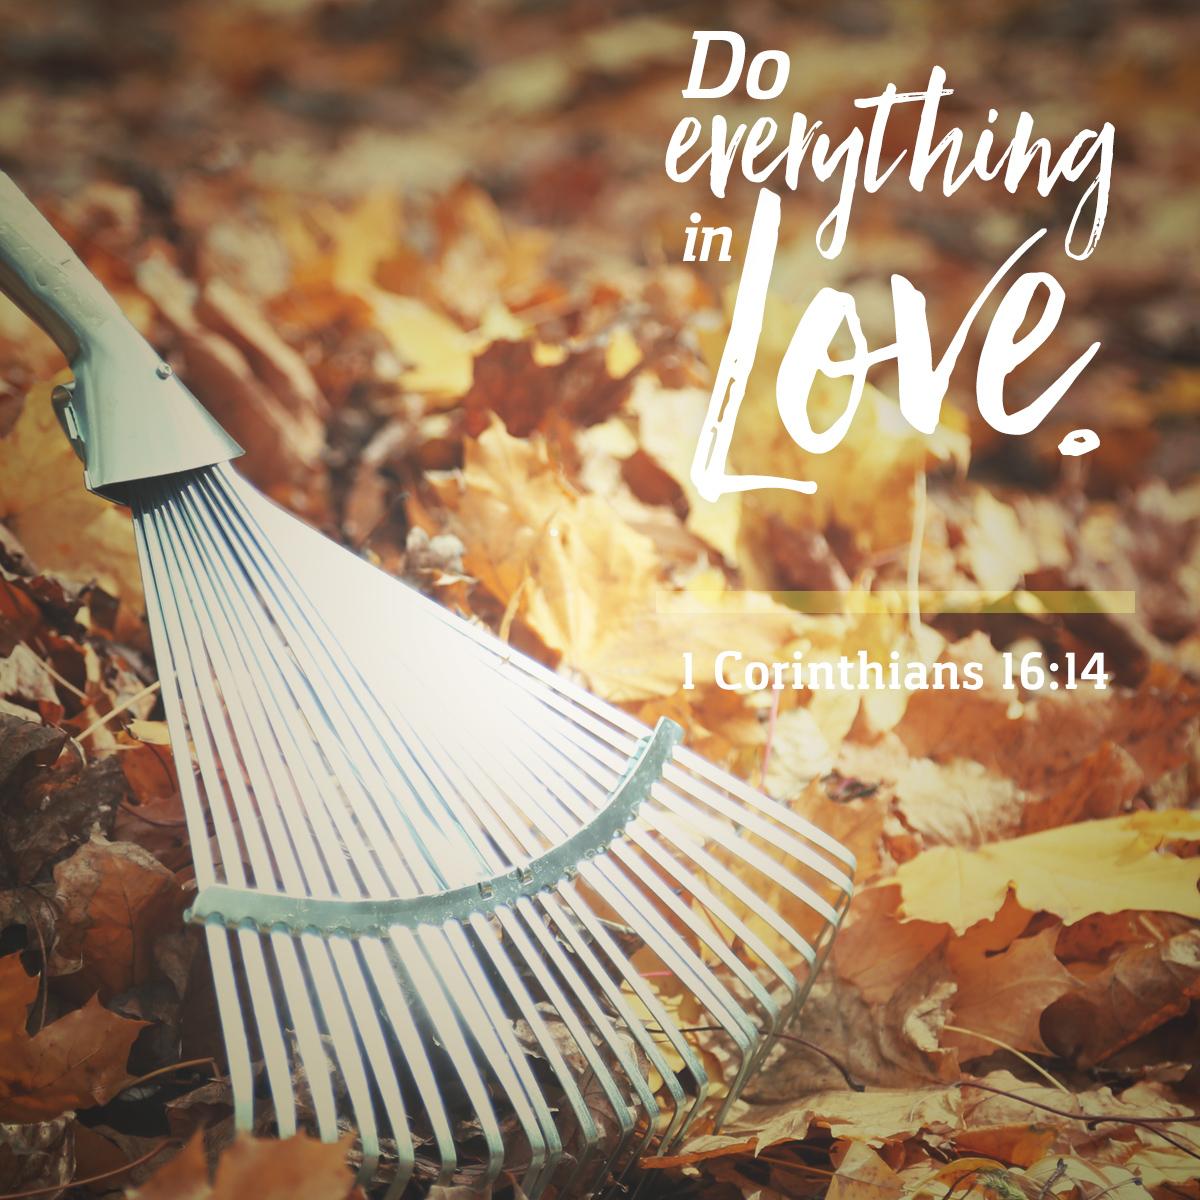 1 Corinthians 16:14 - Daily Verse